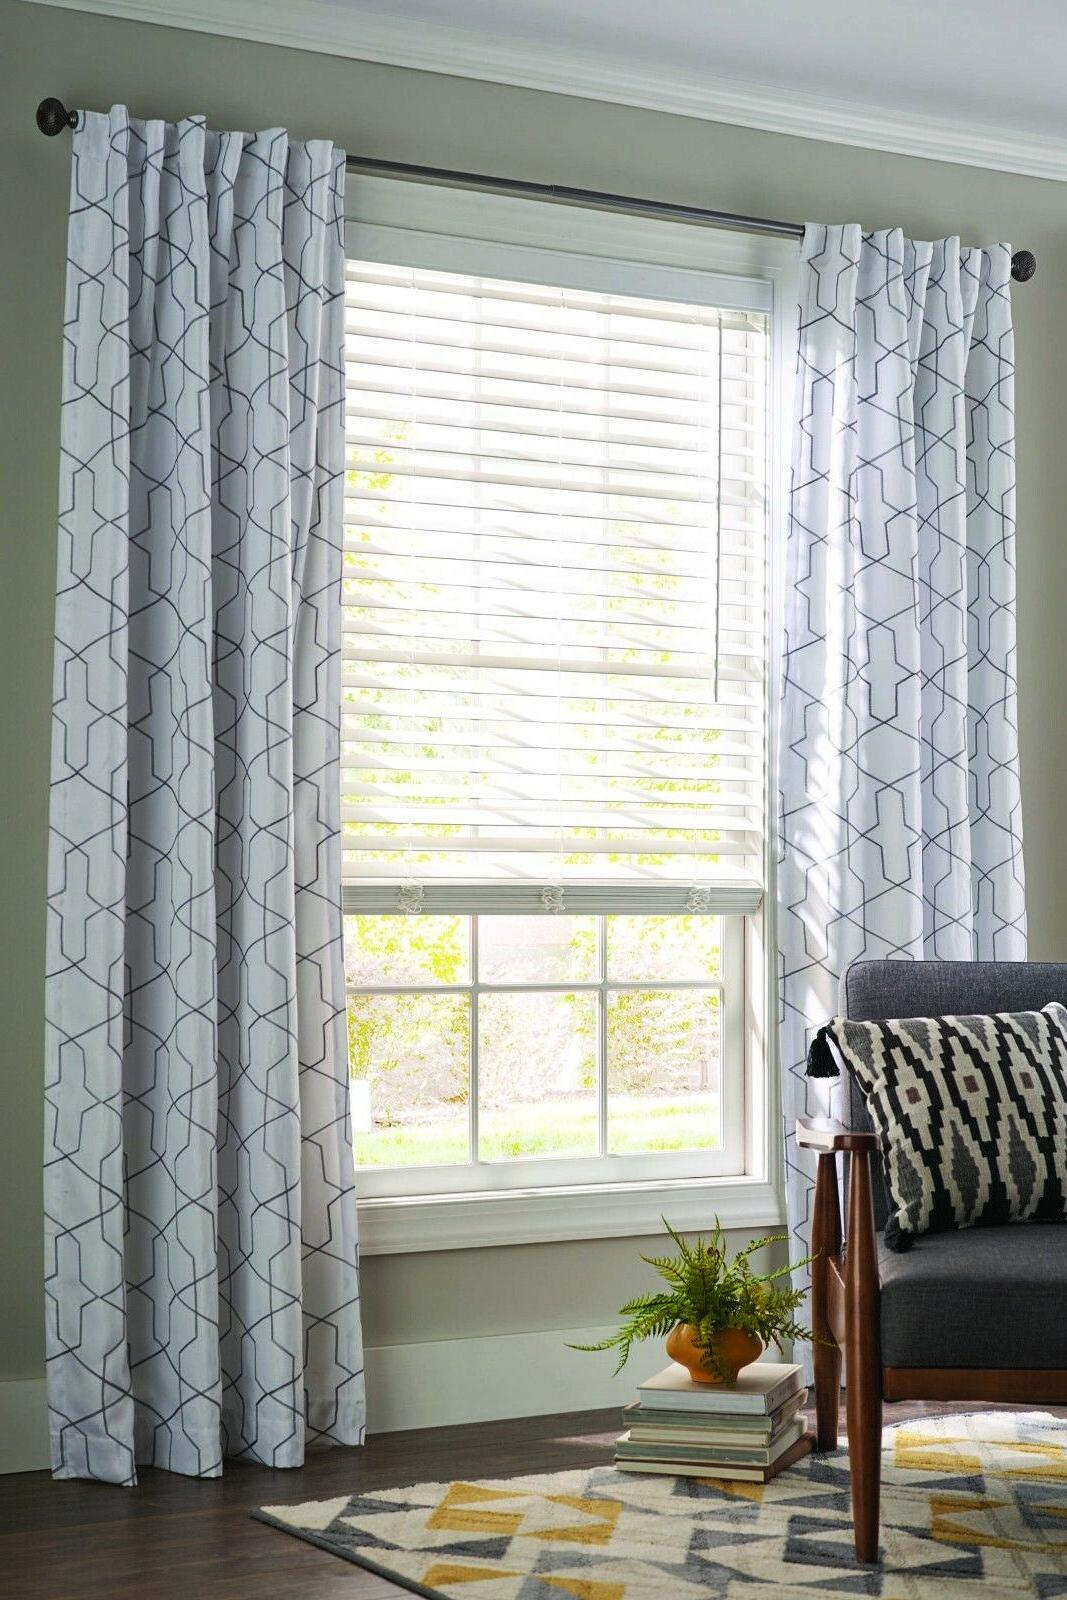 2 inch faux wood blinds window horizontal